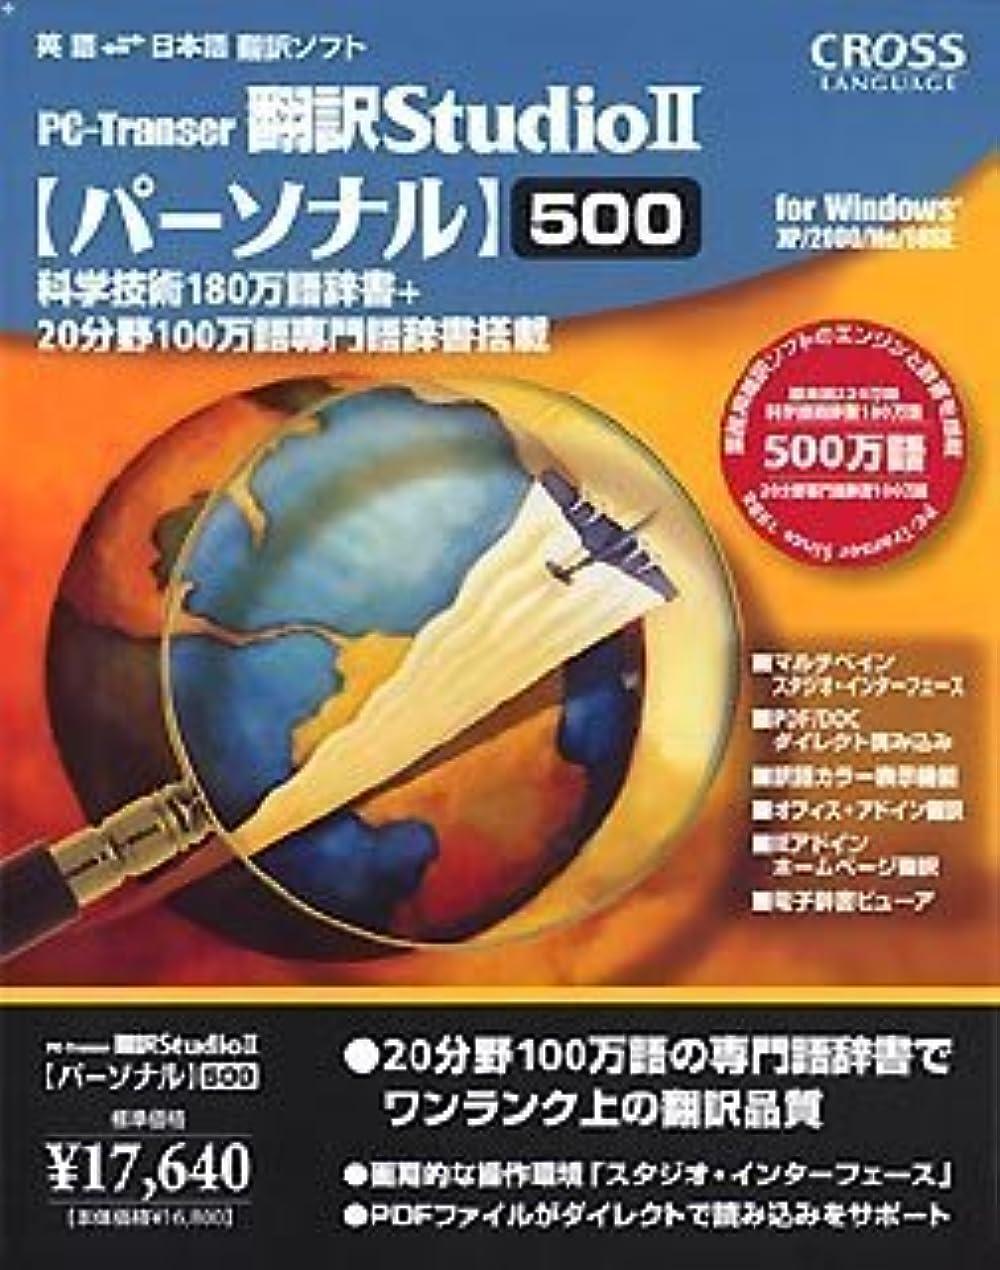 PC-Transer翻訳スタジオ 2 パーソナル500